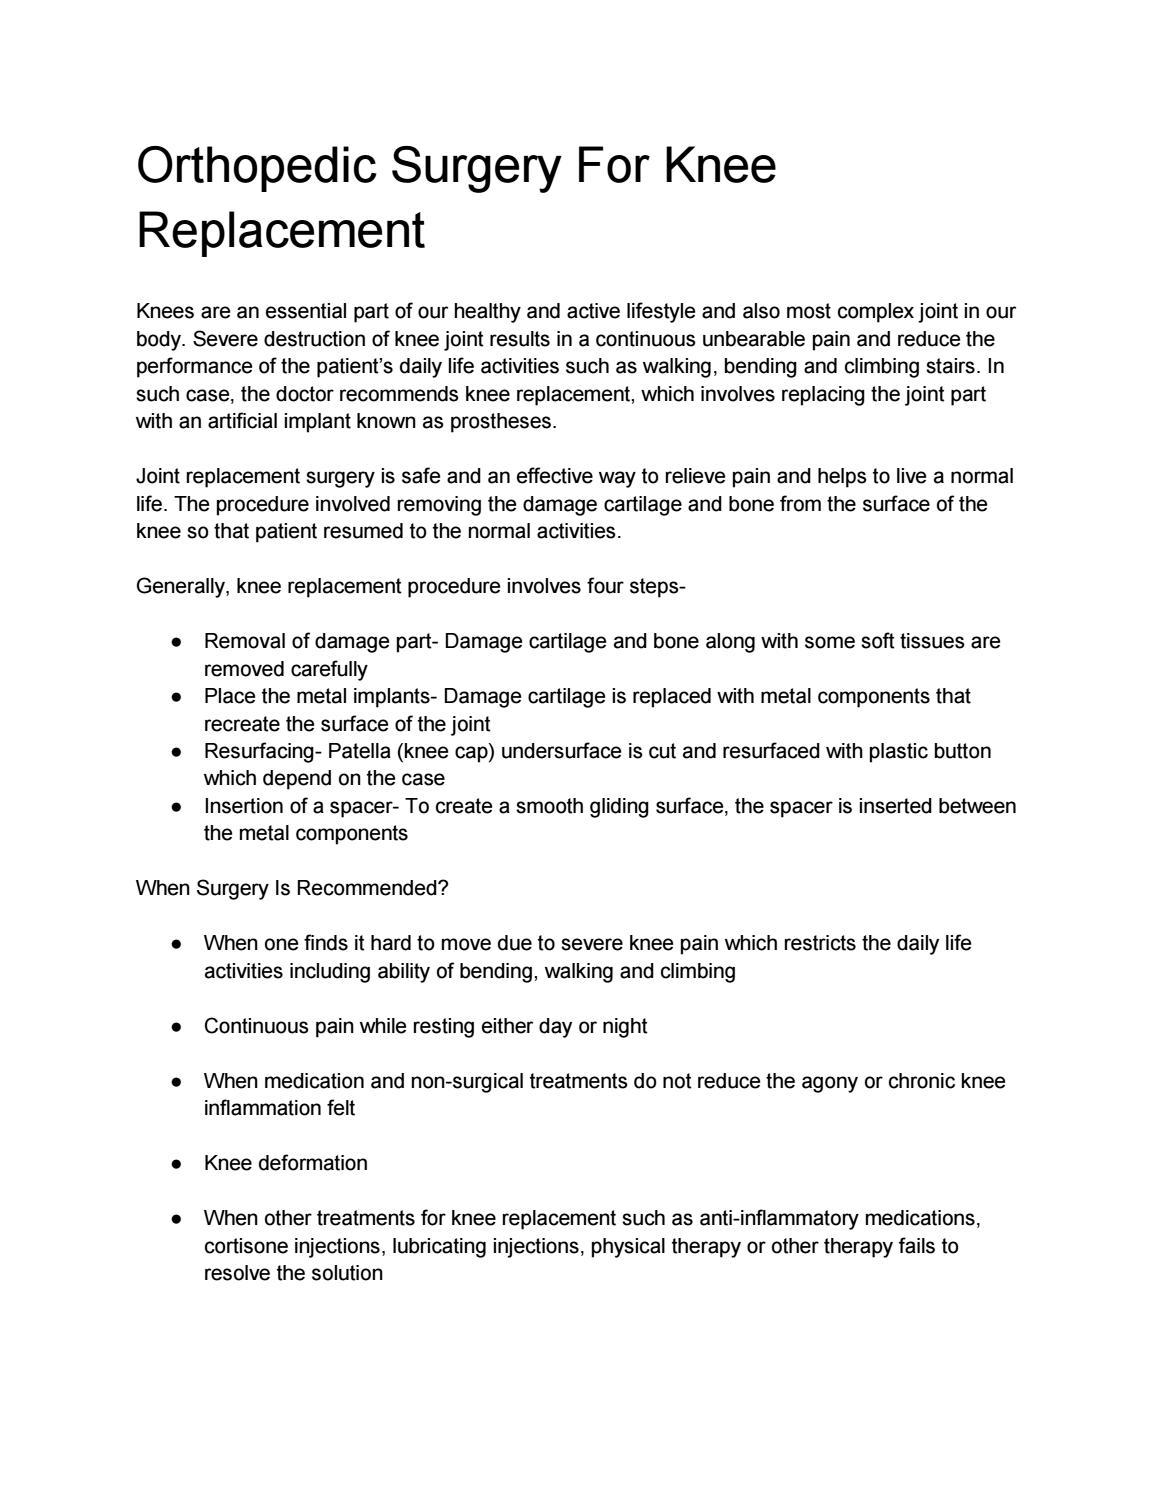 Orthopedic Surgery For Kneereplacement by Harishjay - issuu